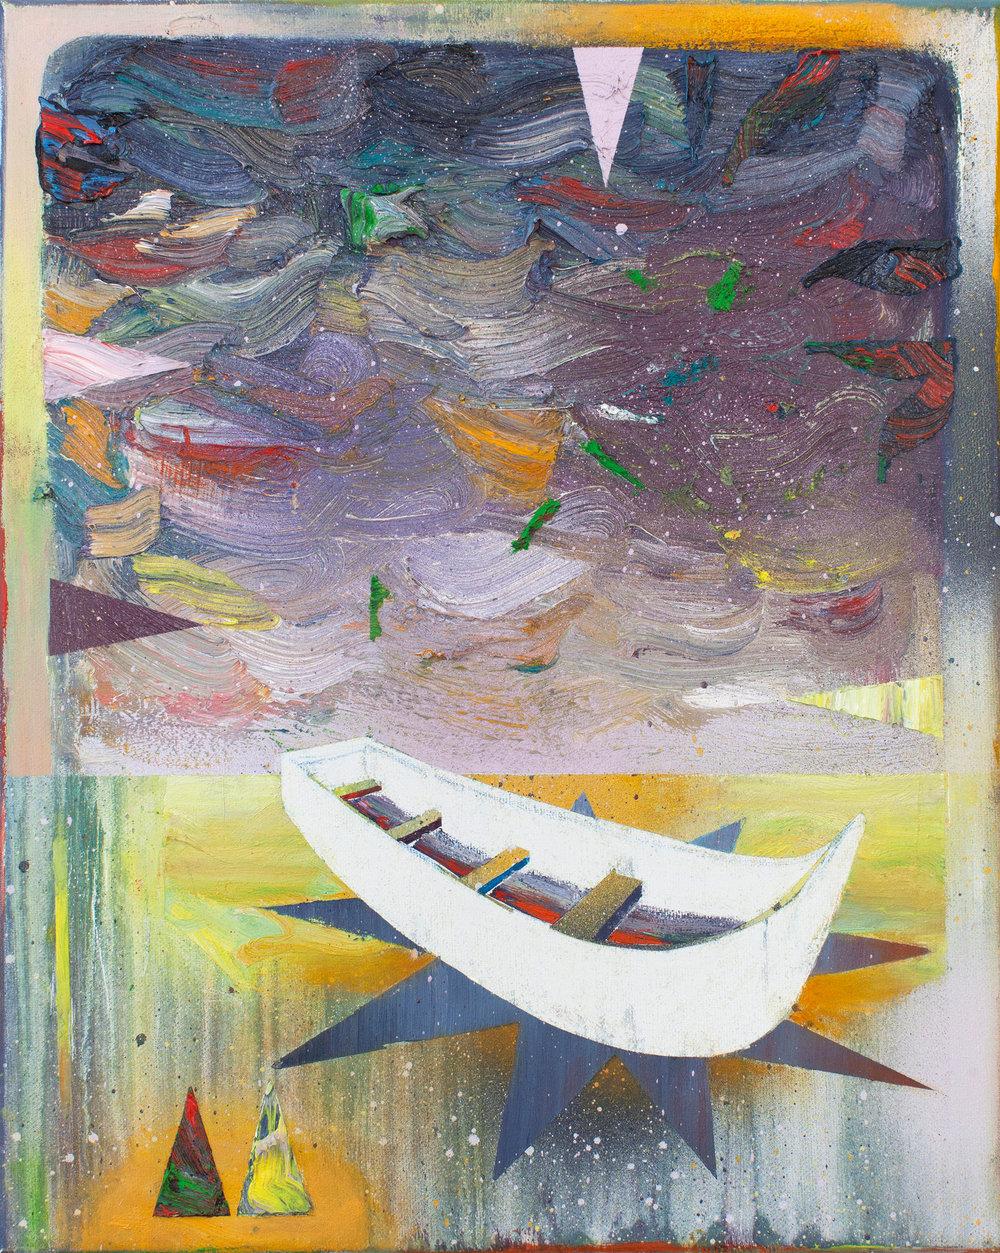 Kanu  oil on canvas 40 x 32 cm, 2018